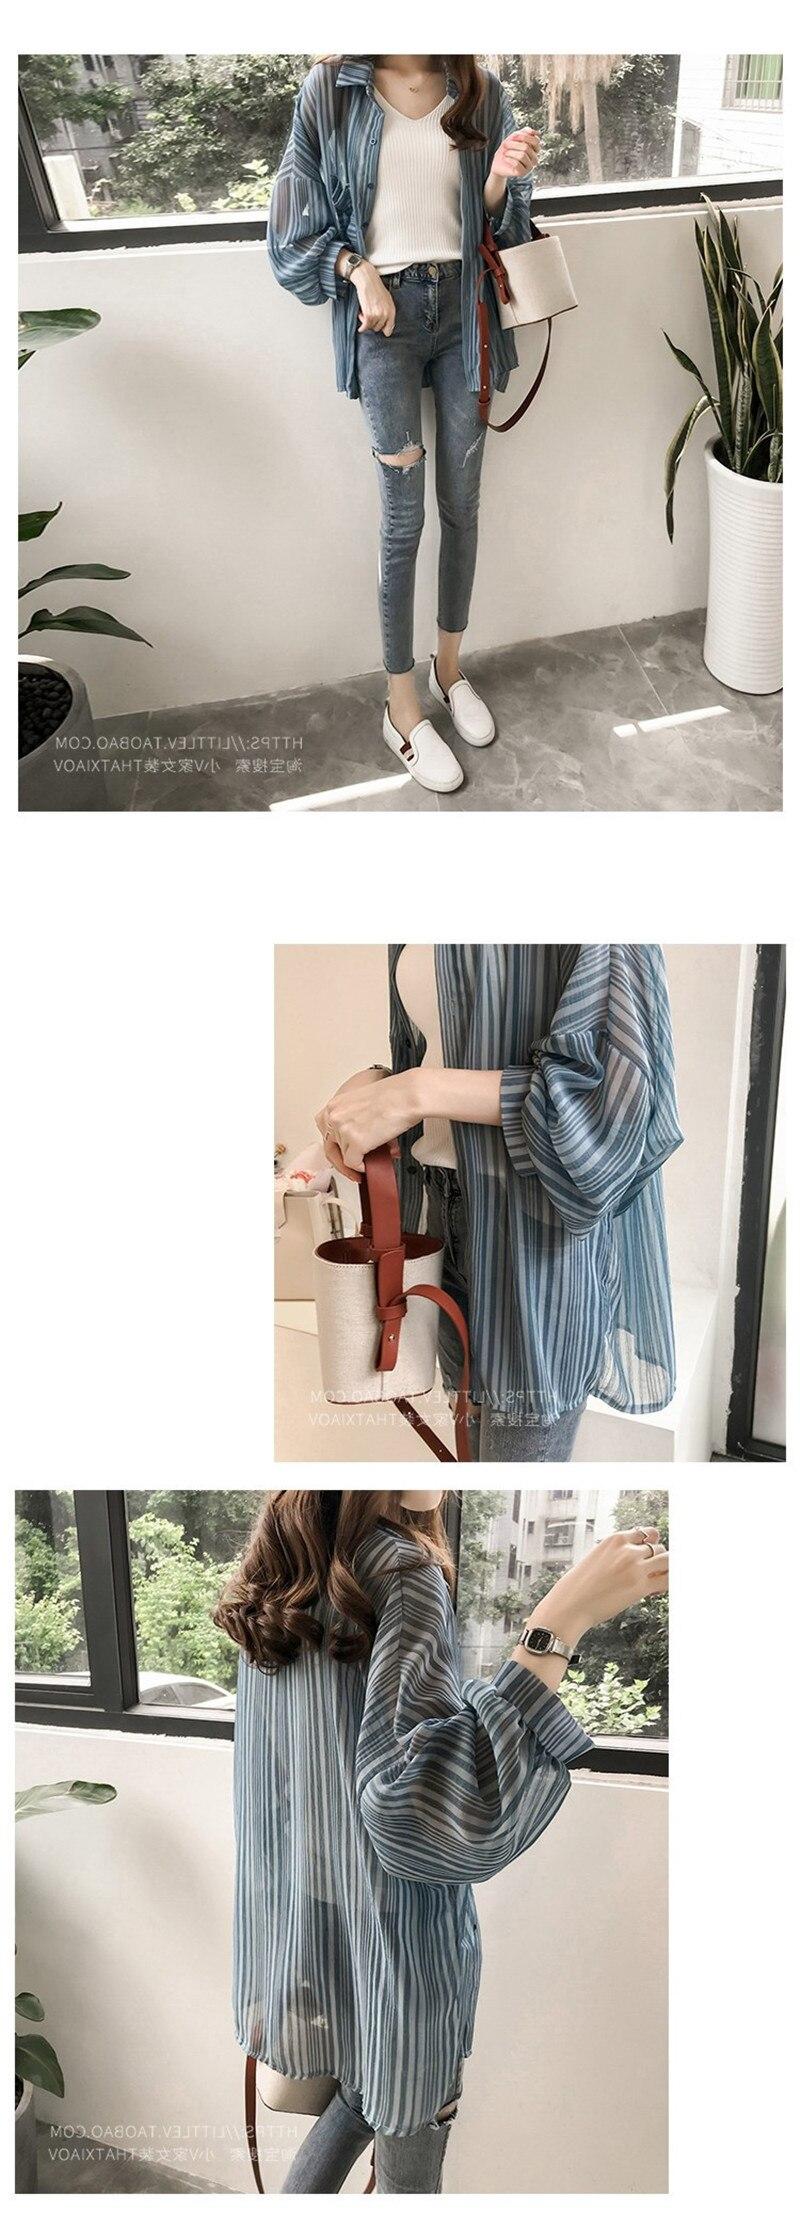 Summer Tops For Women 2019 Loose Lantern Sleeves Striped Shirt Female Chiffon Cardigan Wild Sun Protection Clothings (2)